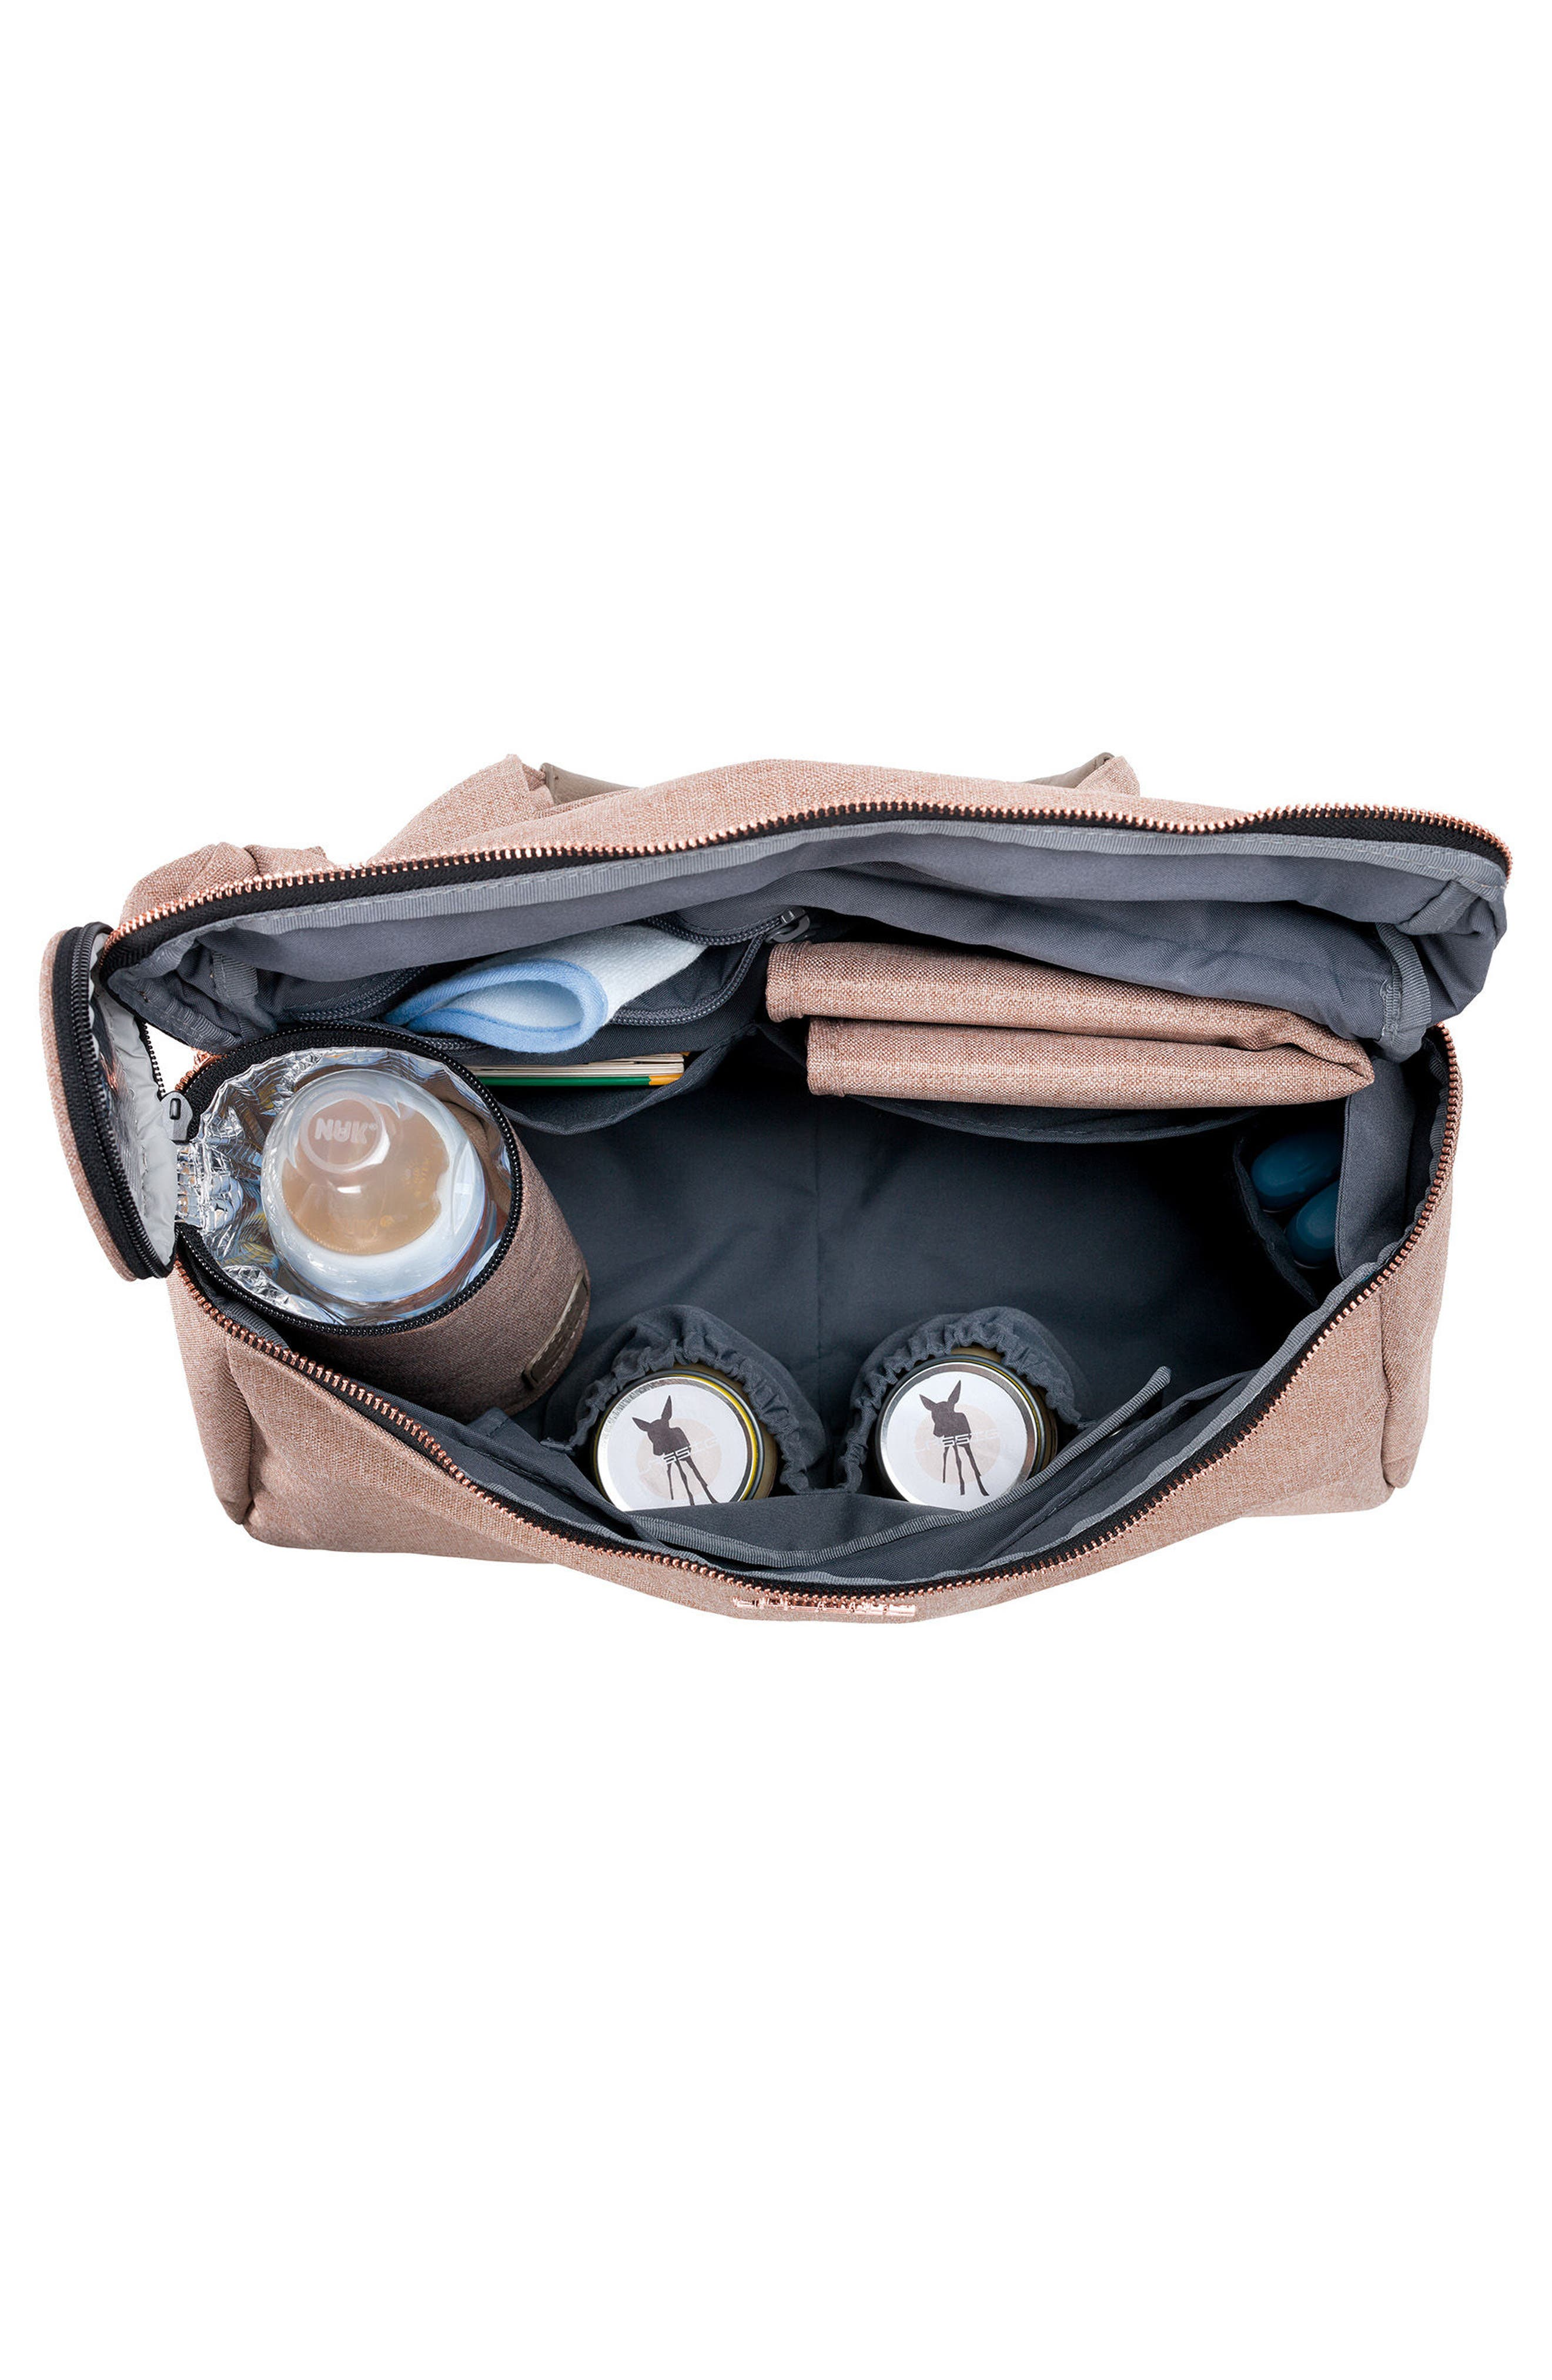 Alternate Image 3  - Lässig Glam Rosie Diaper Bag